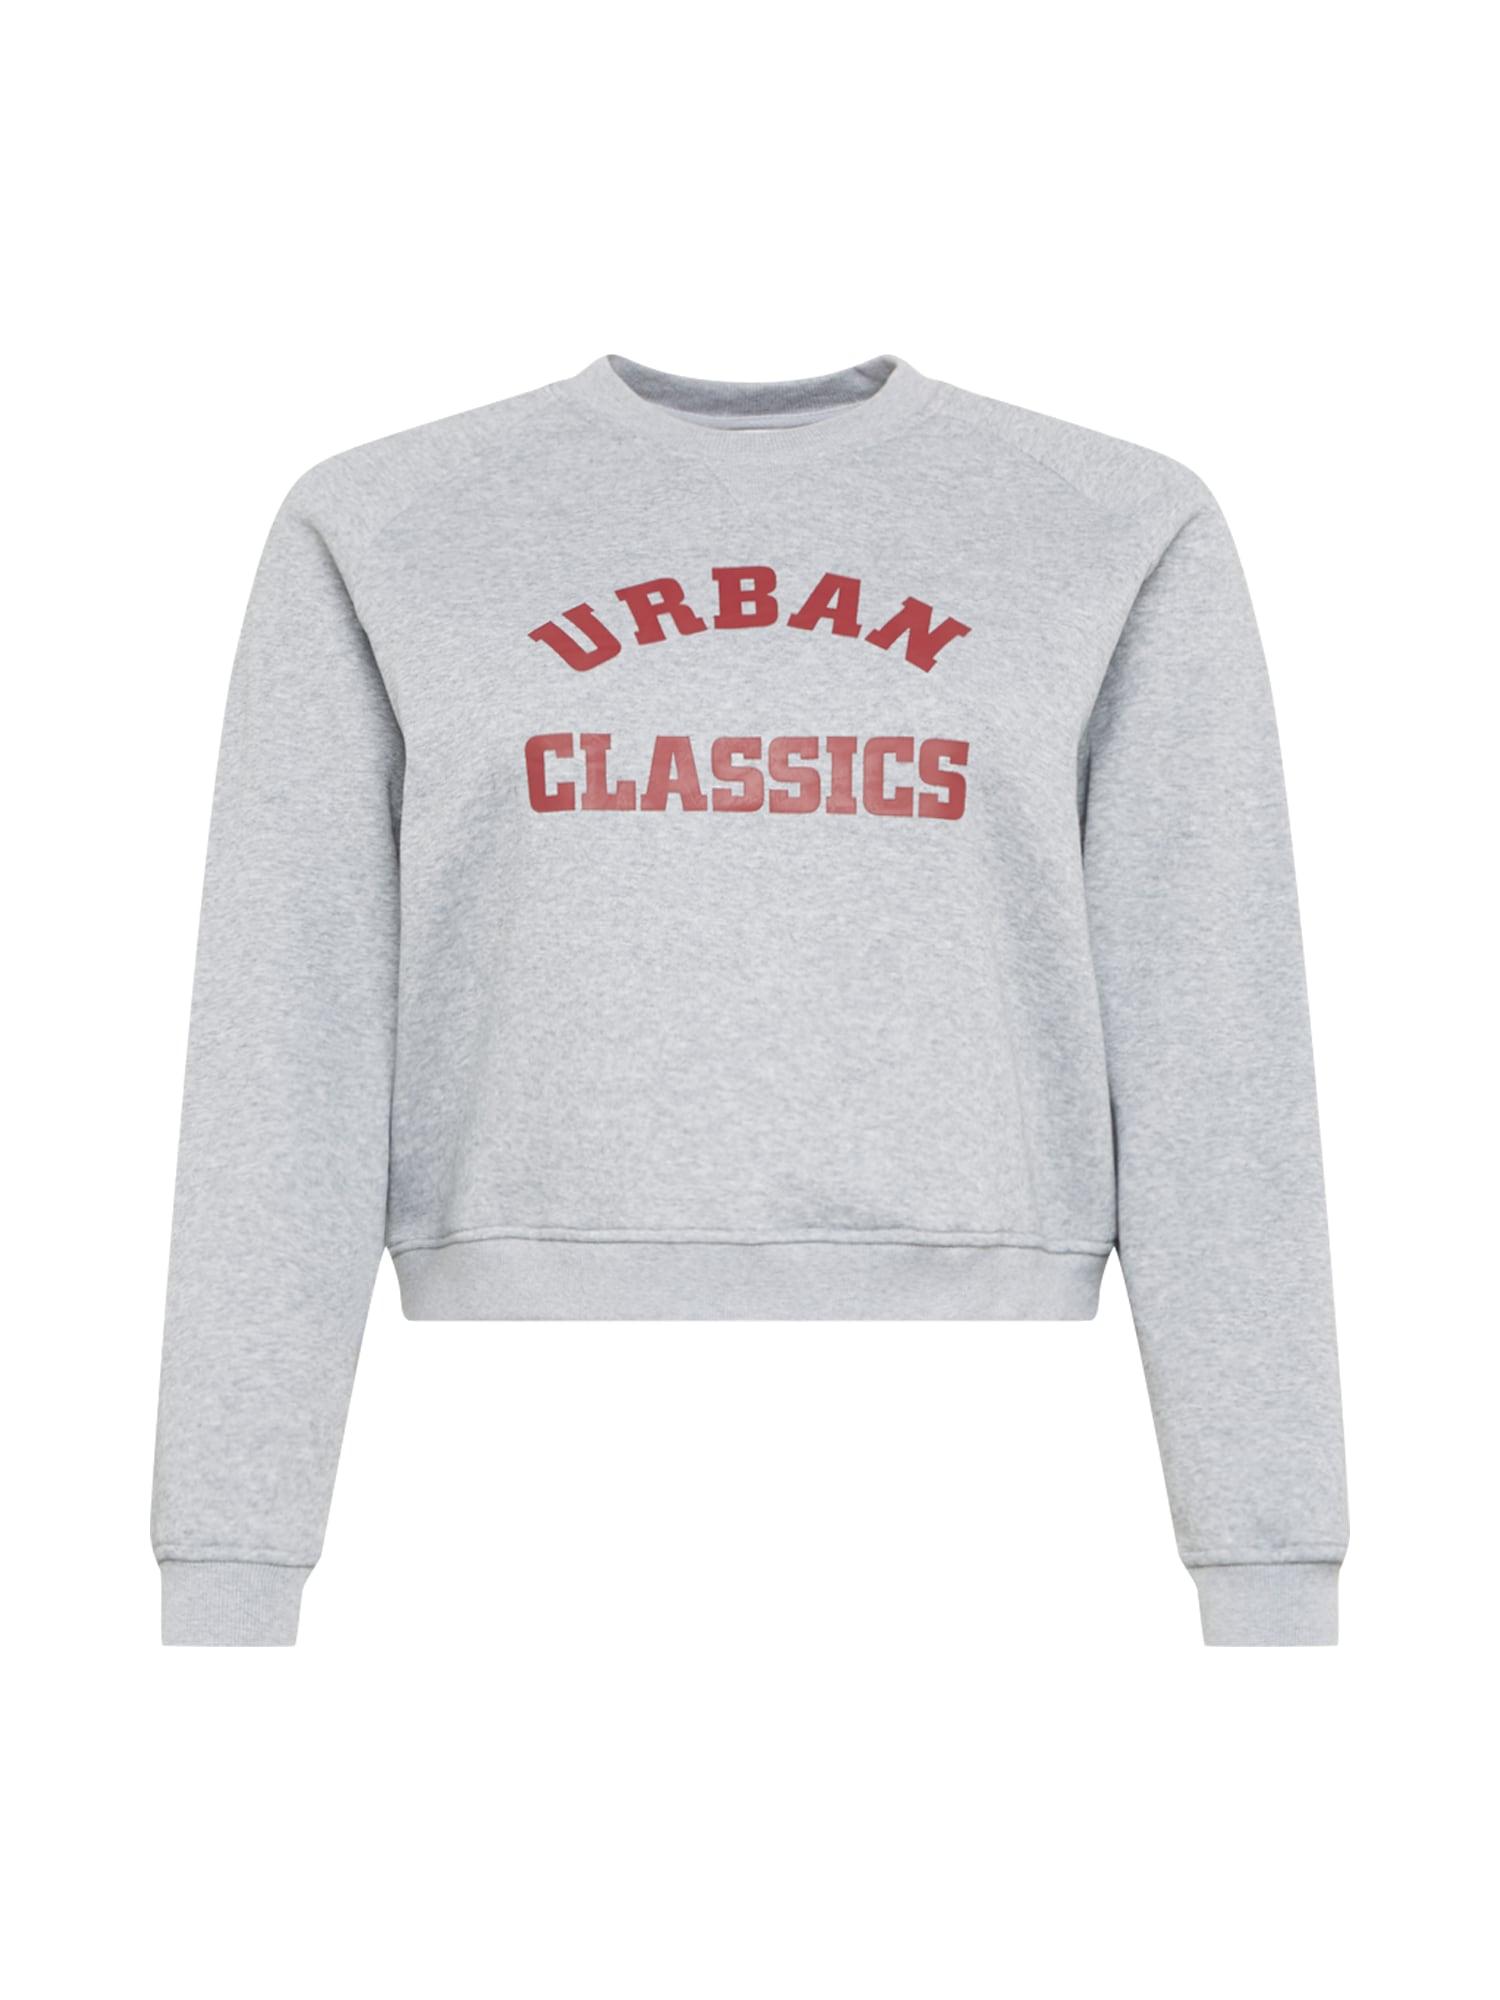 Urban Classics Curvy Megztinis be užsegimo pilka / vyno raudona spalva